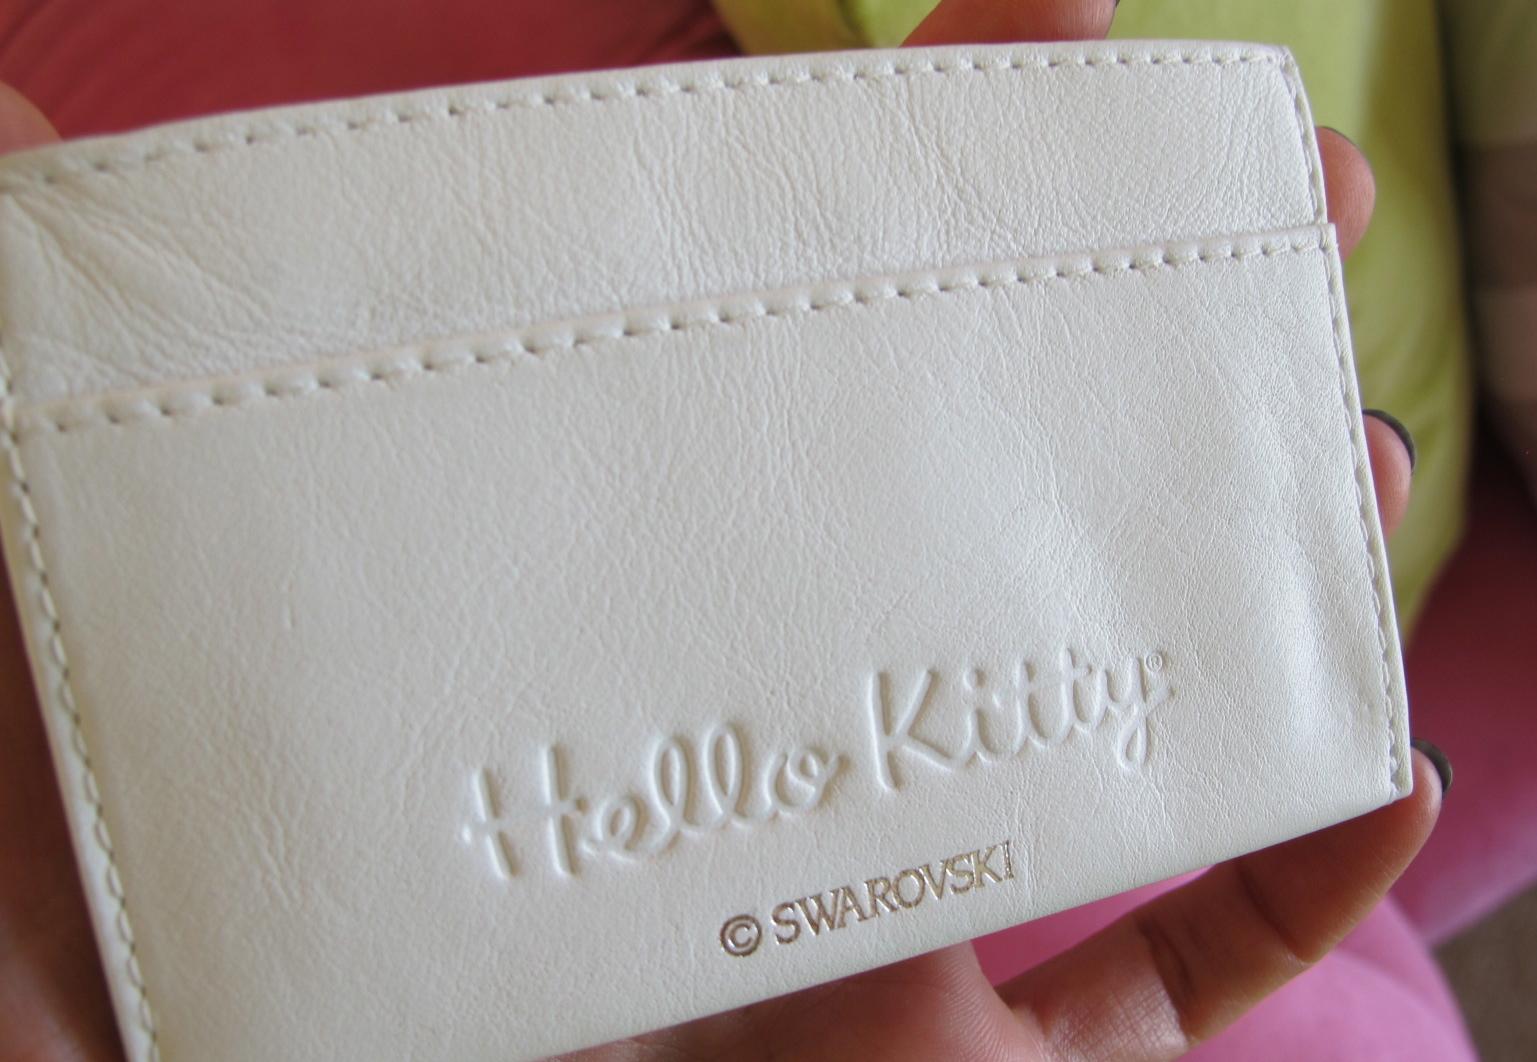 7e92112d9 kandeej.com: Hello Kitty, Swarovski Sparkle, and why I'm weird: